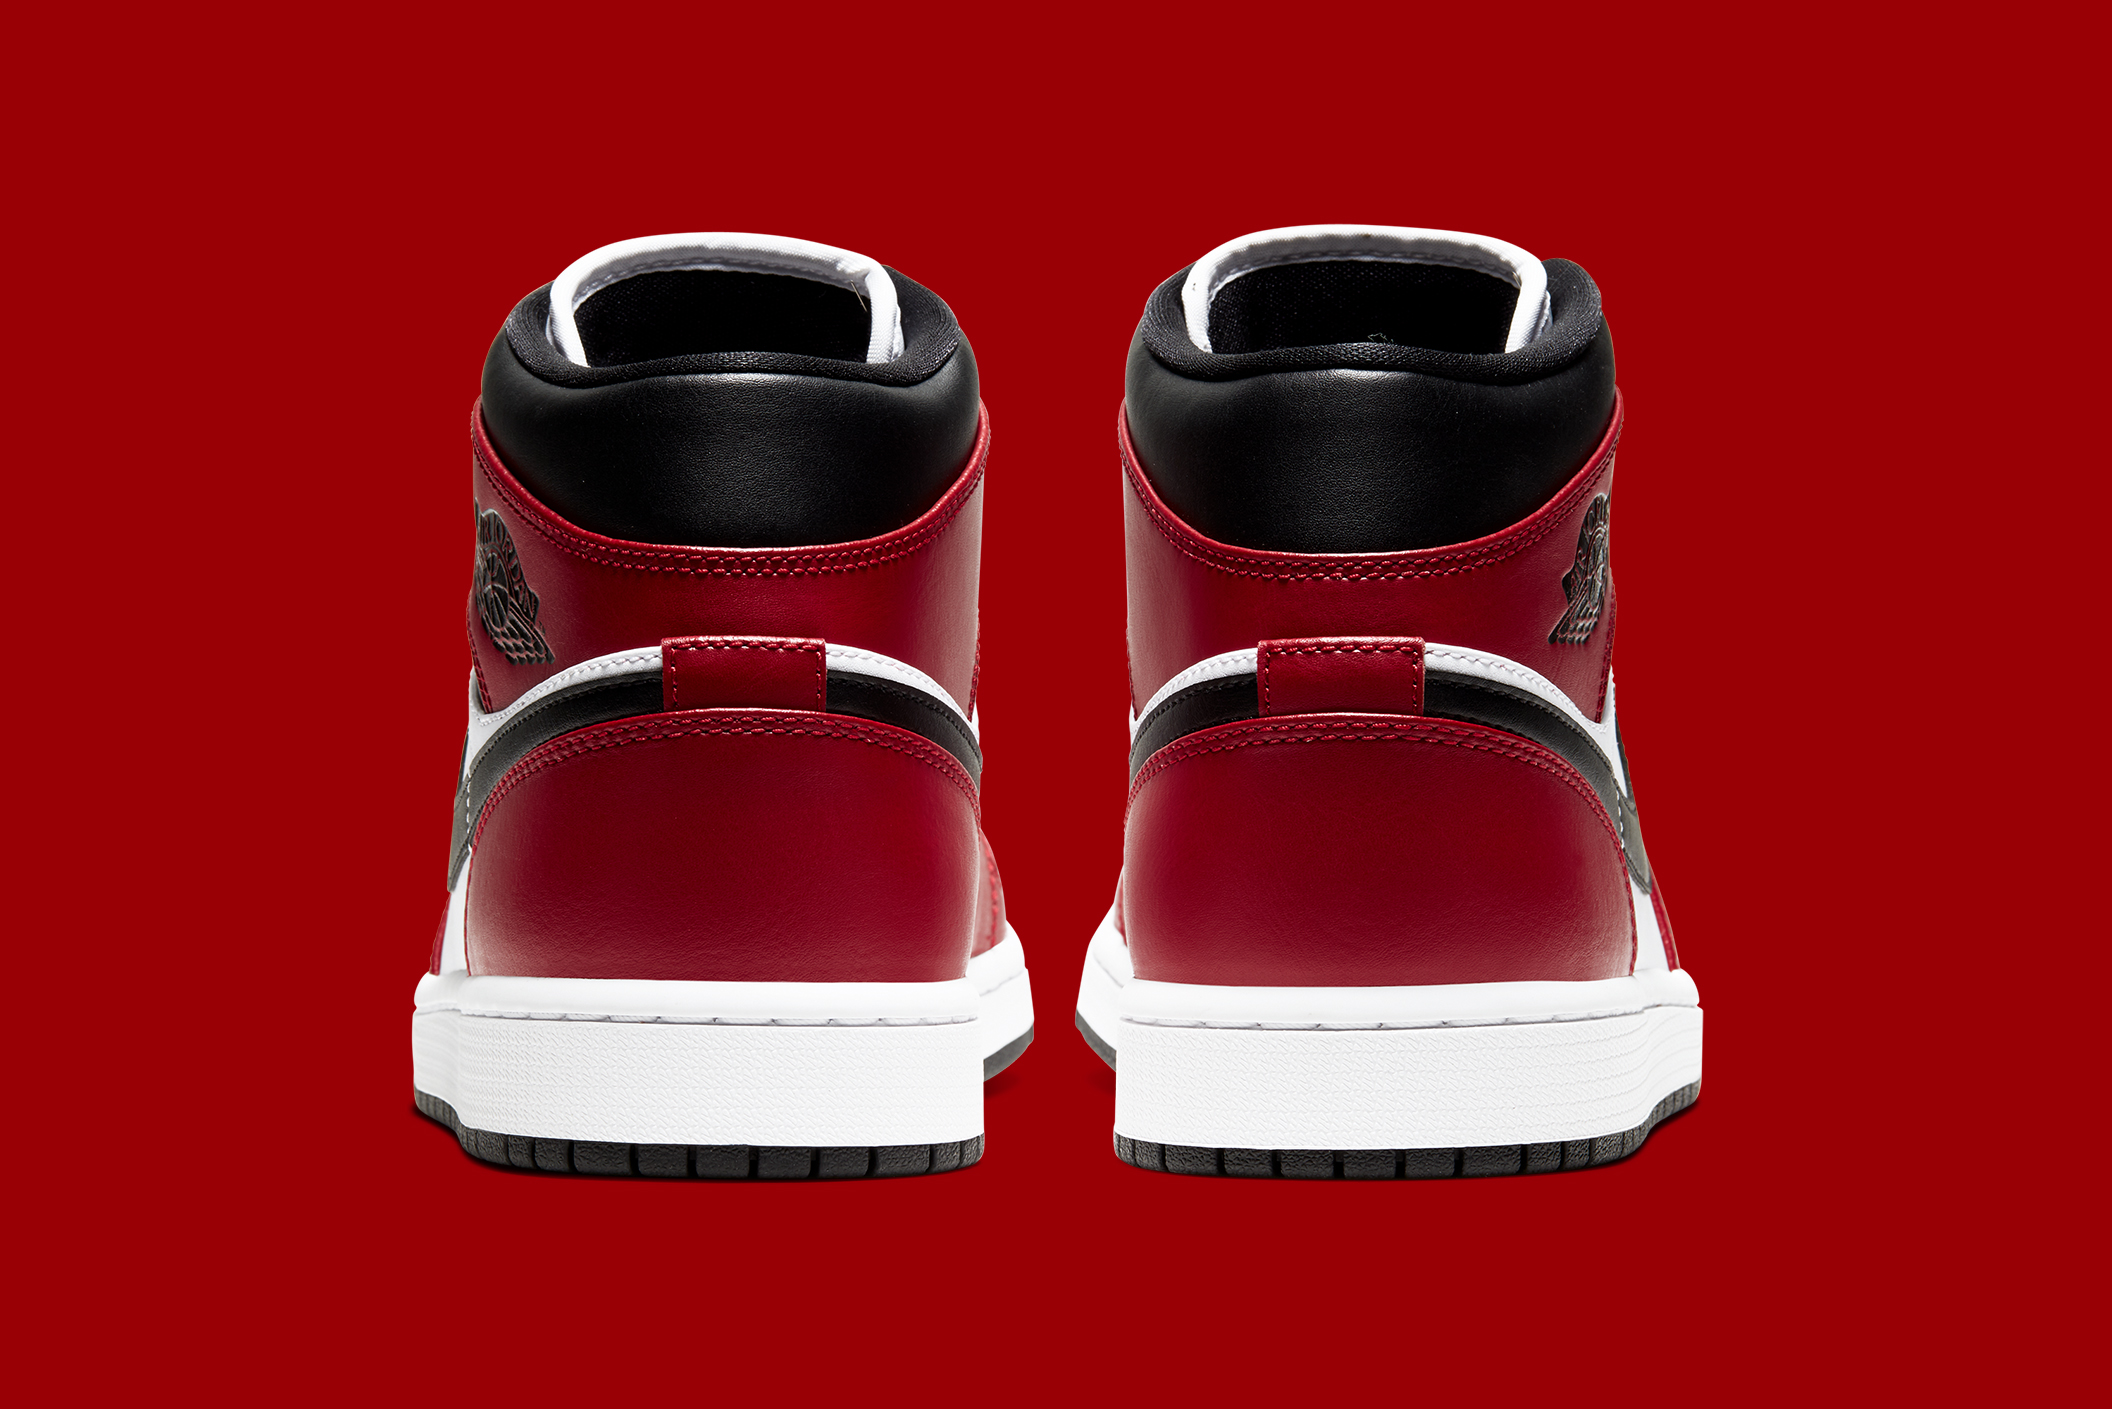 Air Jordan 1 Mid Chicago Black Toe Shelflife